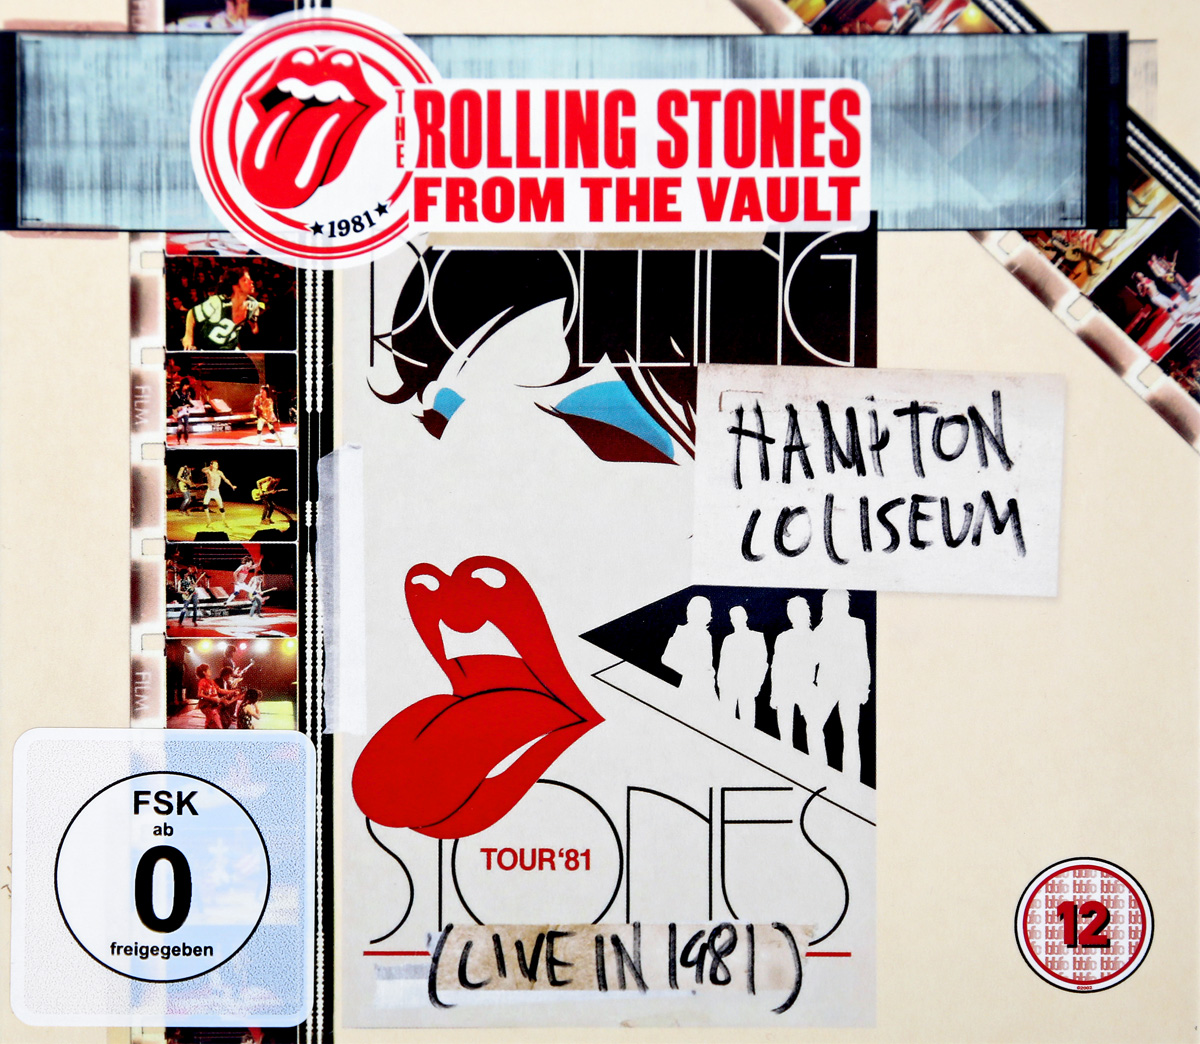 The Rolling Stones The Rolling Stones. From The Vault Hampton Coliseum (Live In 1981) (2 CD + DVD) rolling stones the from the vault live in leeds 1982 dvd 2 cd